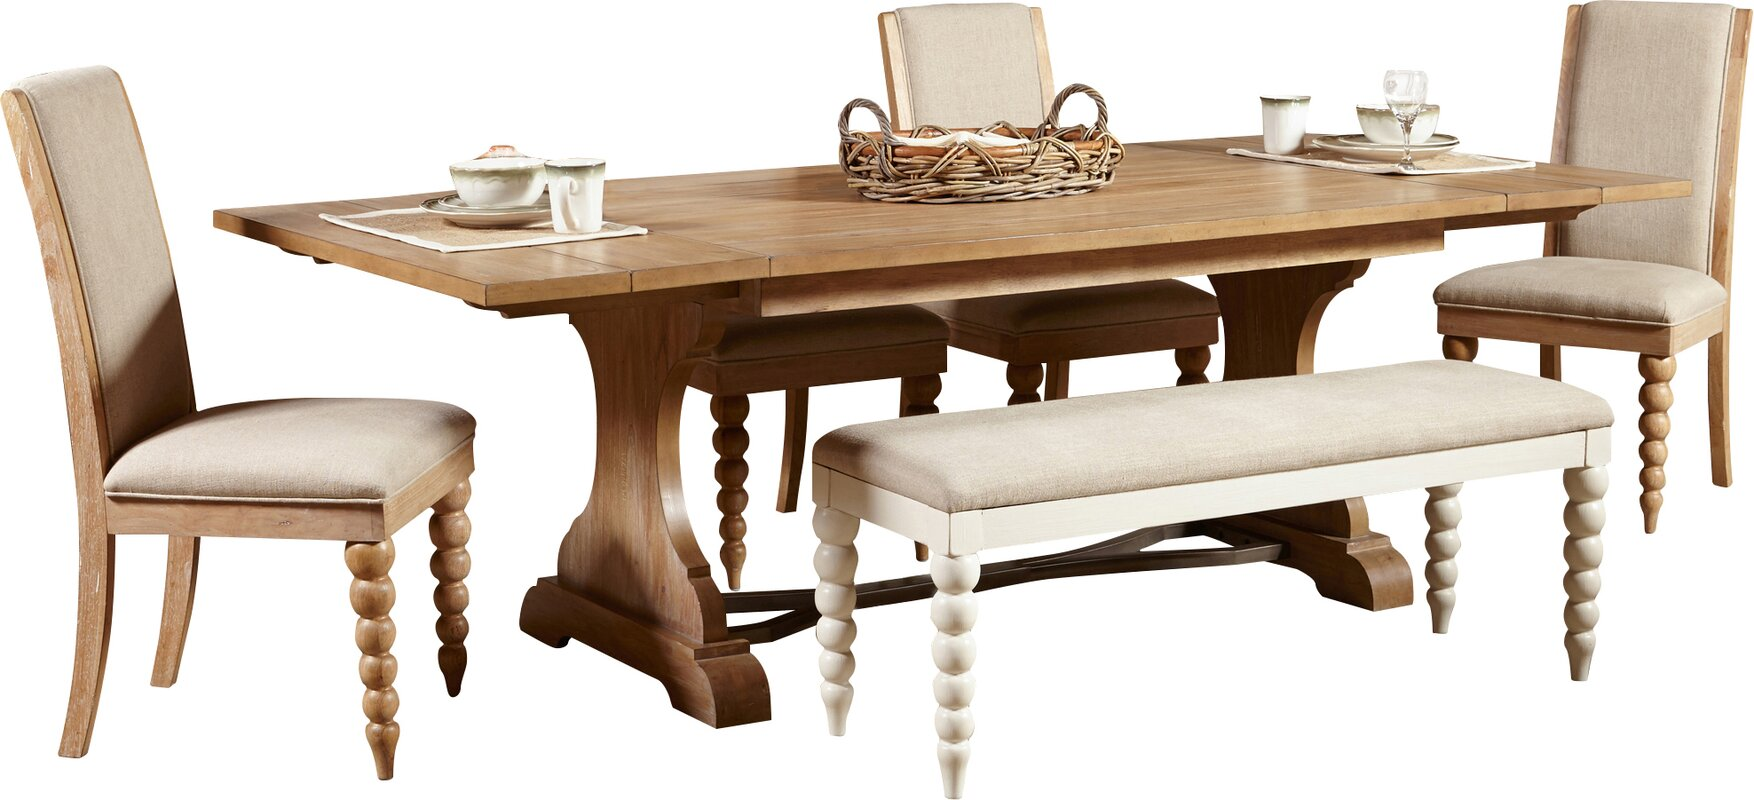 Bleau Trestle Dining Table